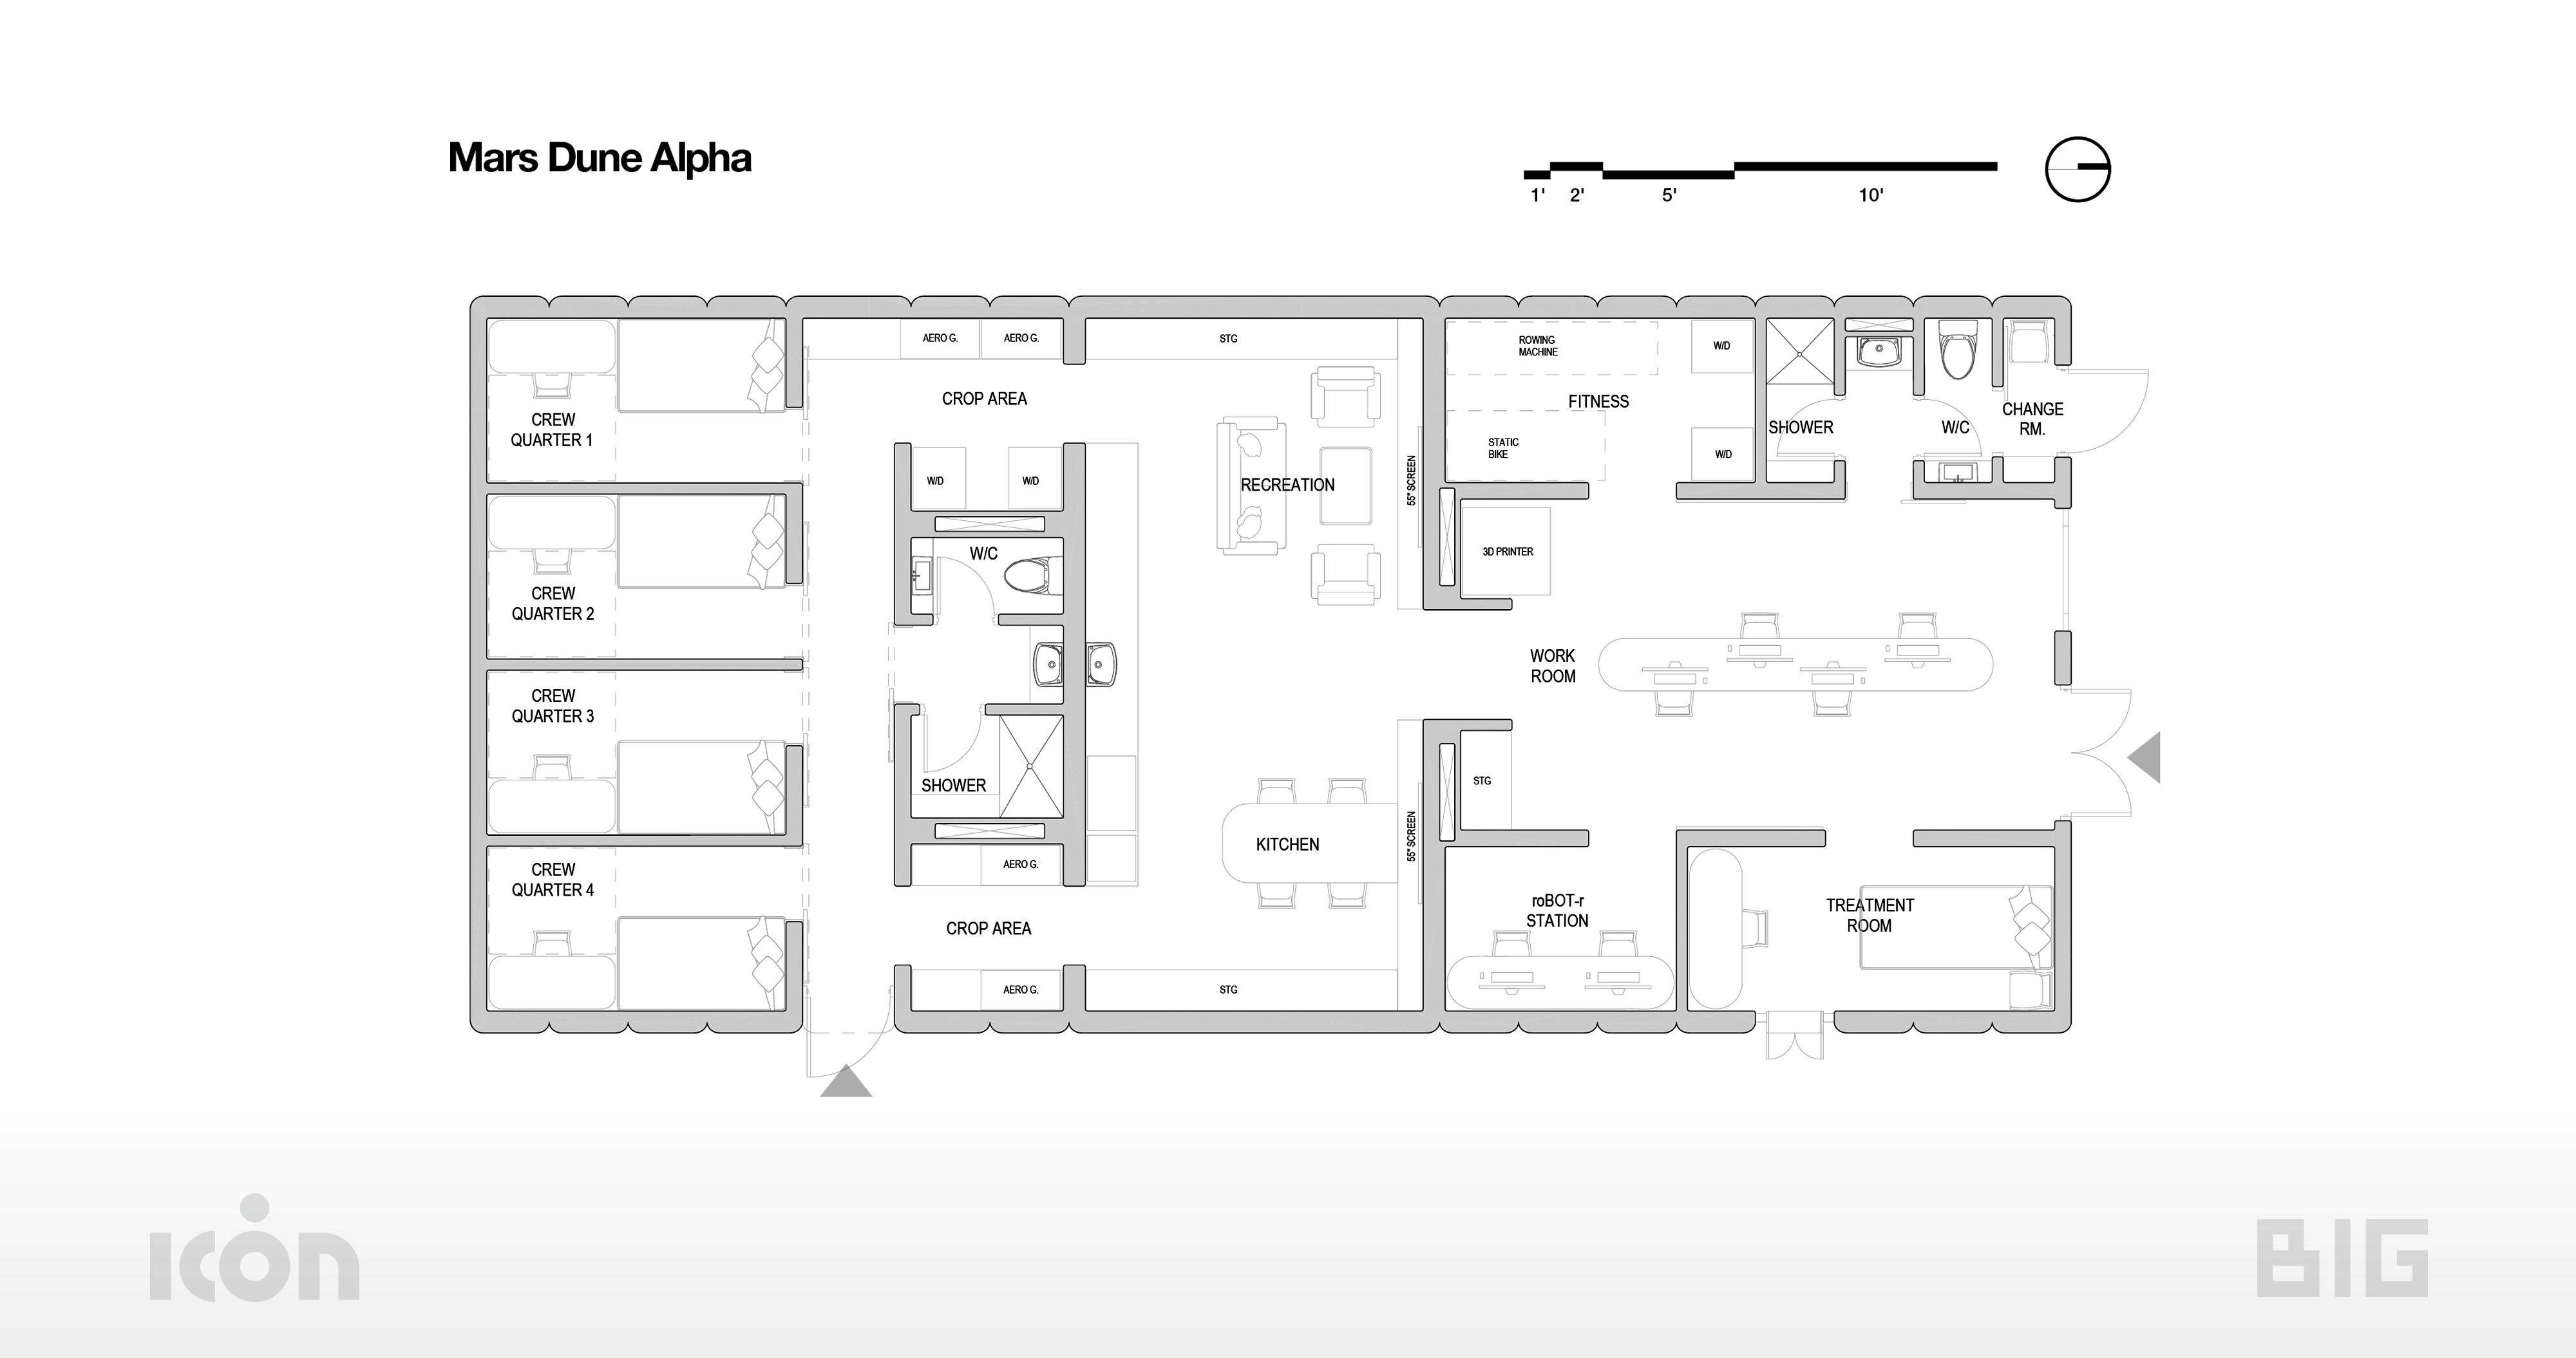 Floorplan of Mars Dune Alpha